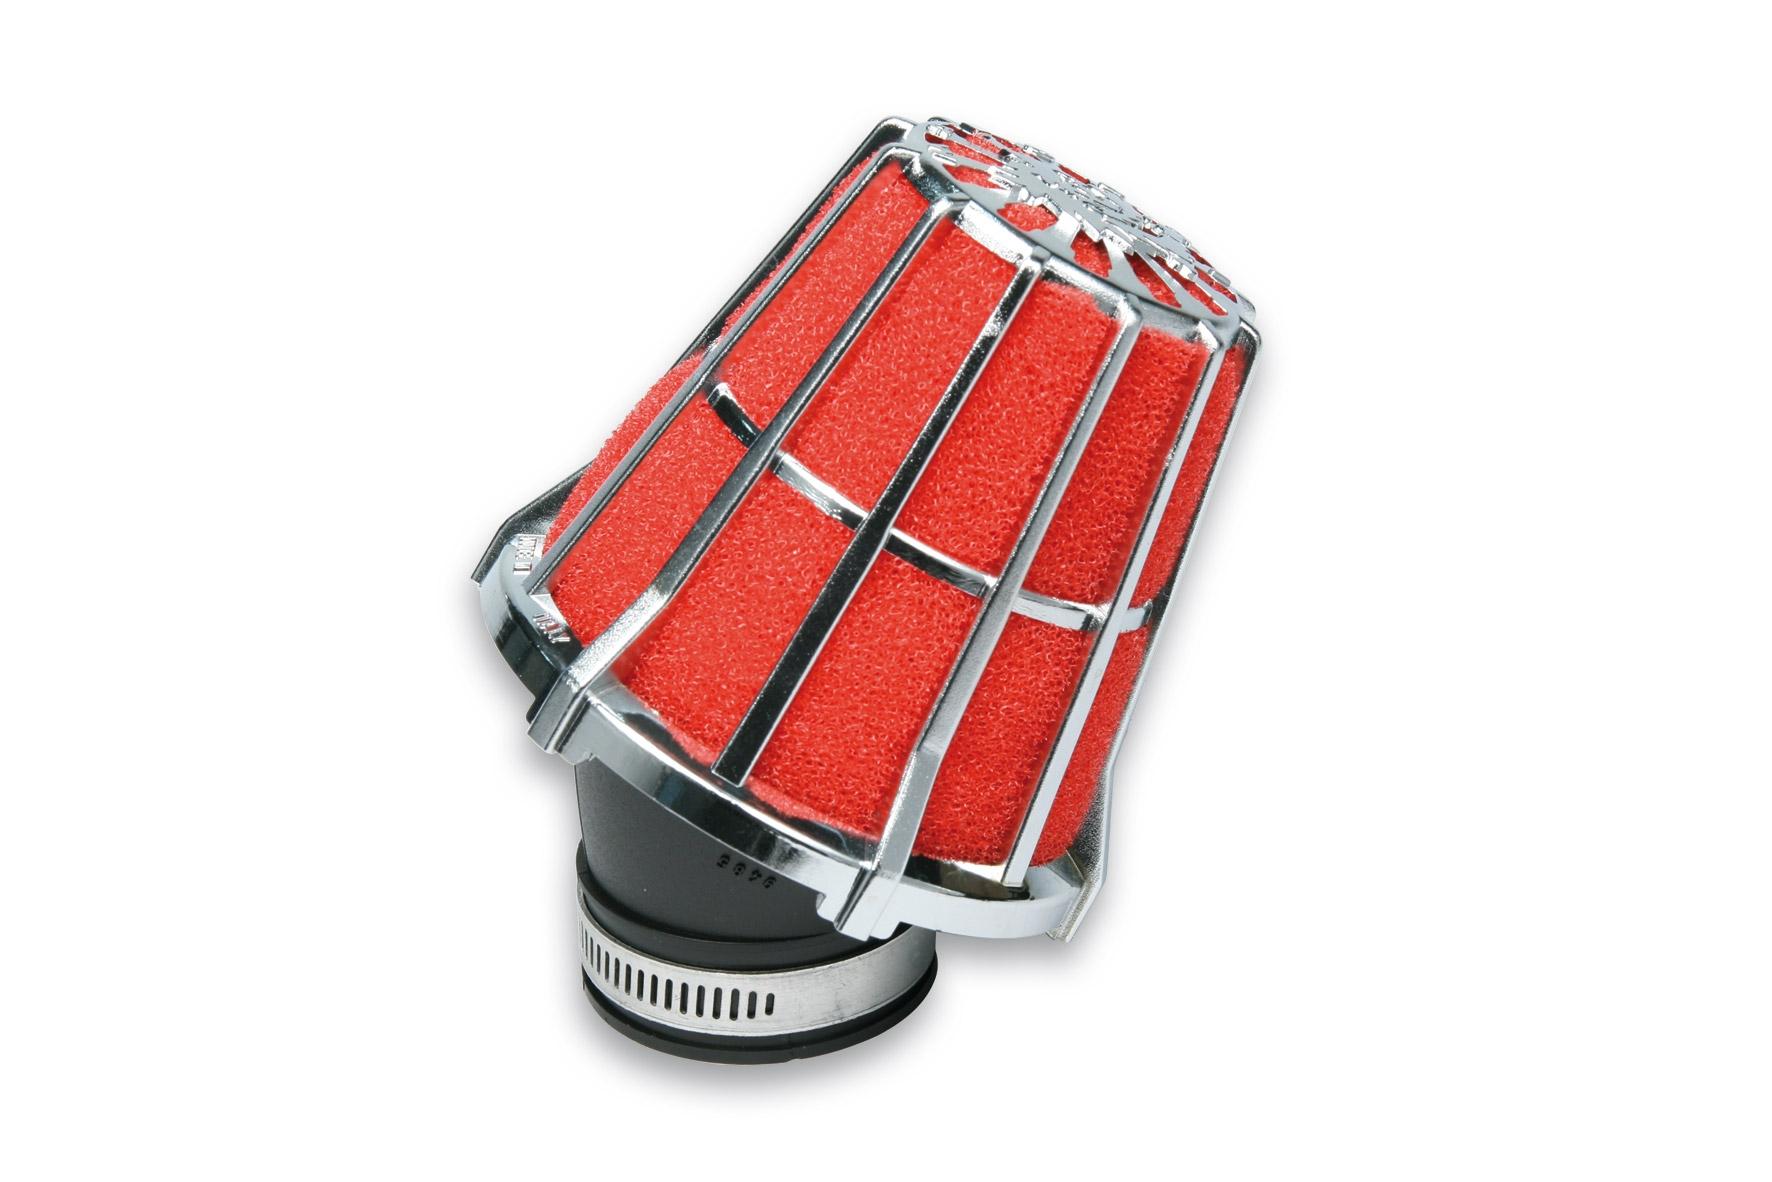 Filtre à air Malossi Red Filter E5 D.38 incliné 30 chromé